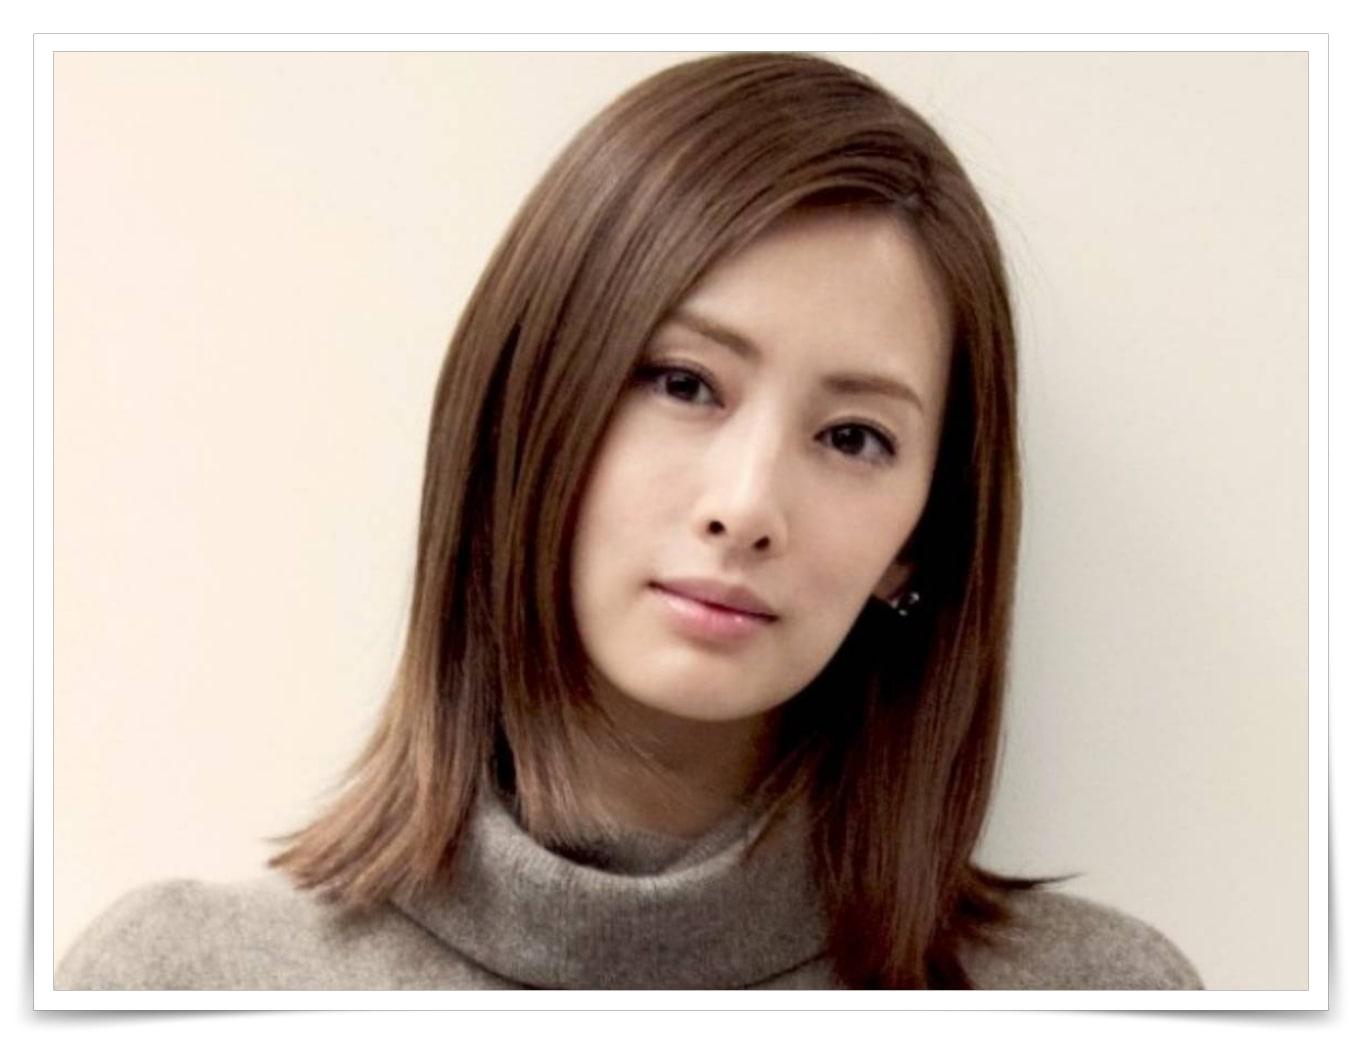 安住紳一郎の歴代彼女、画像、目撃、元カノ、北川景子